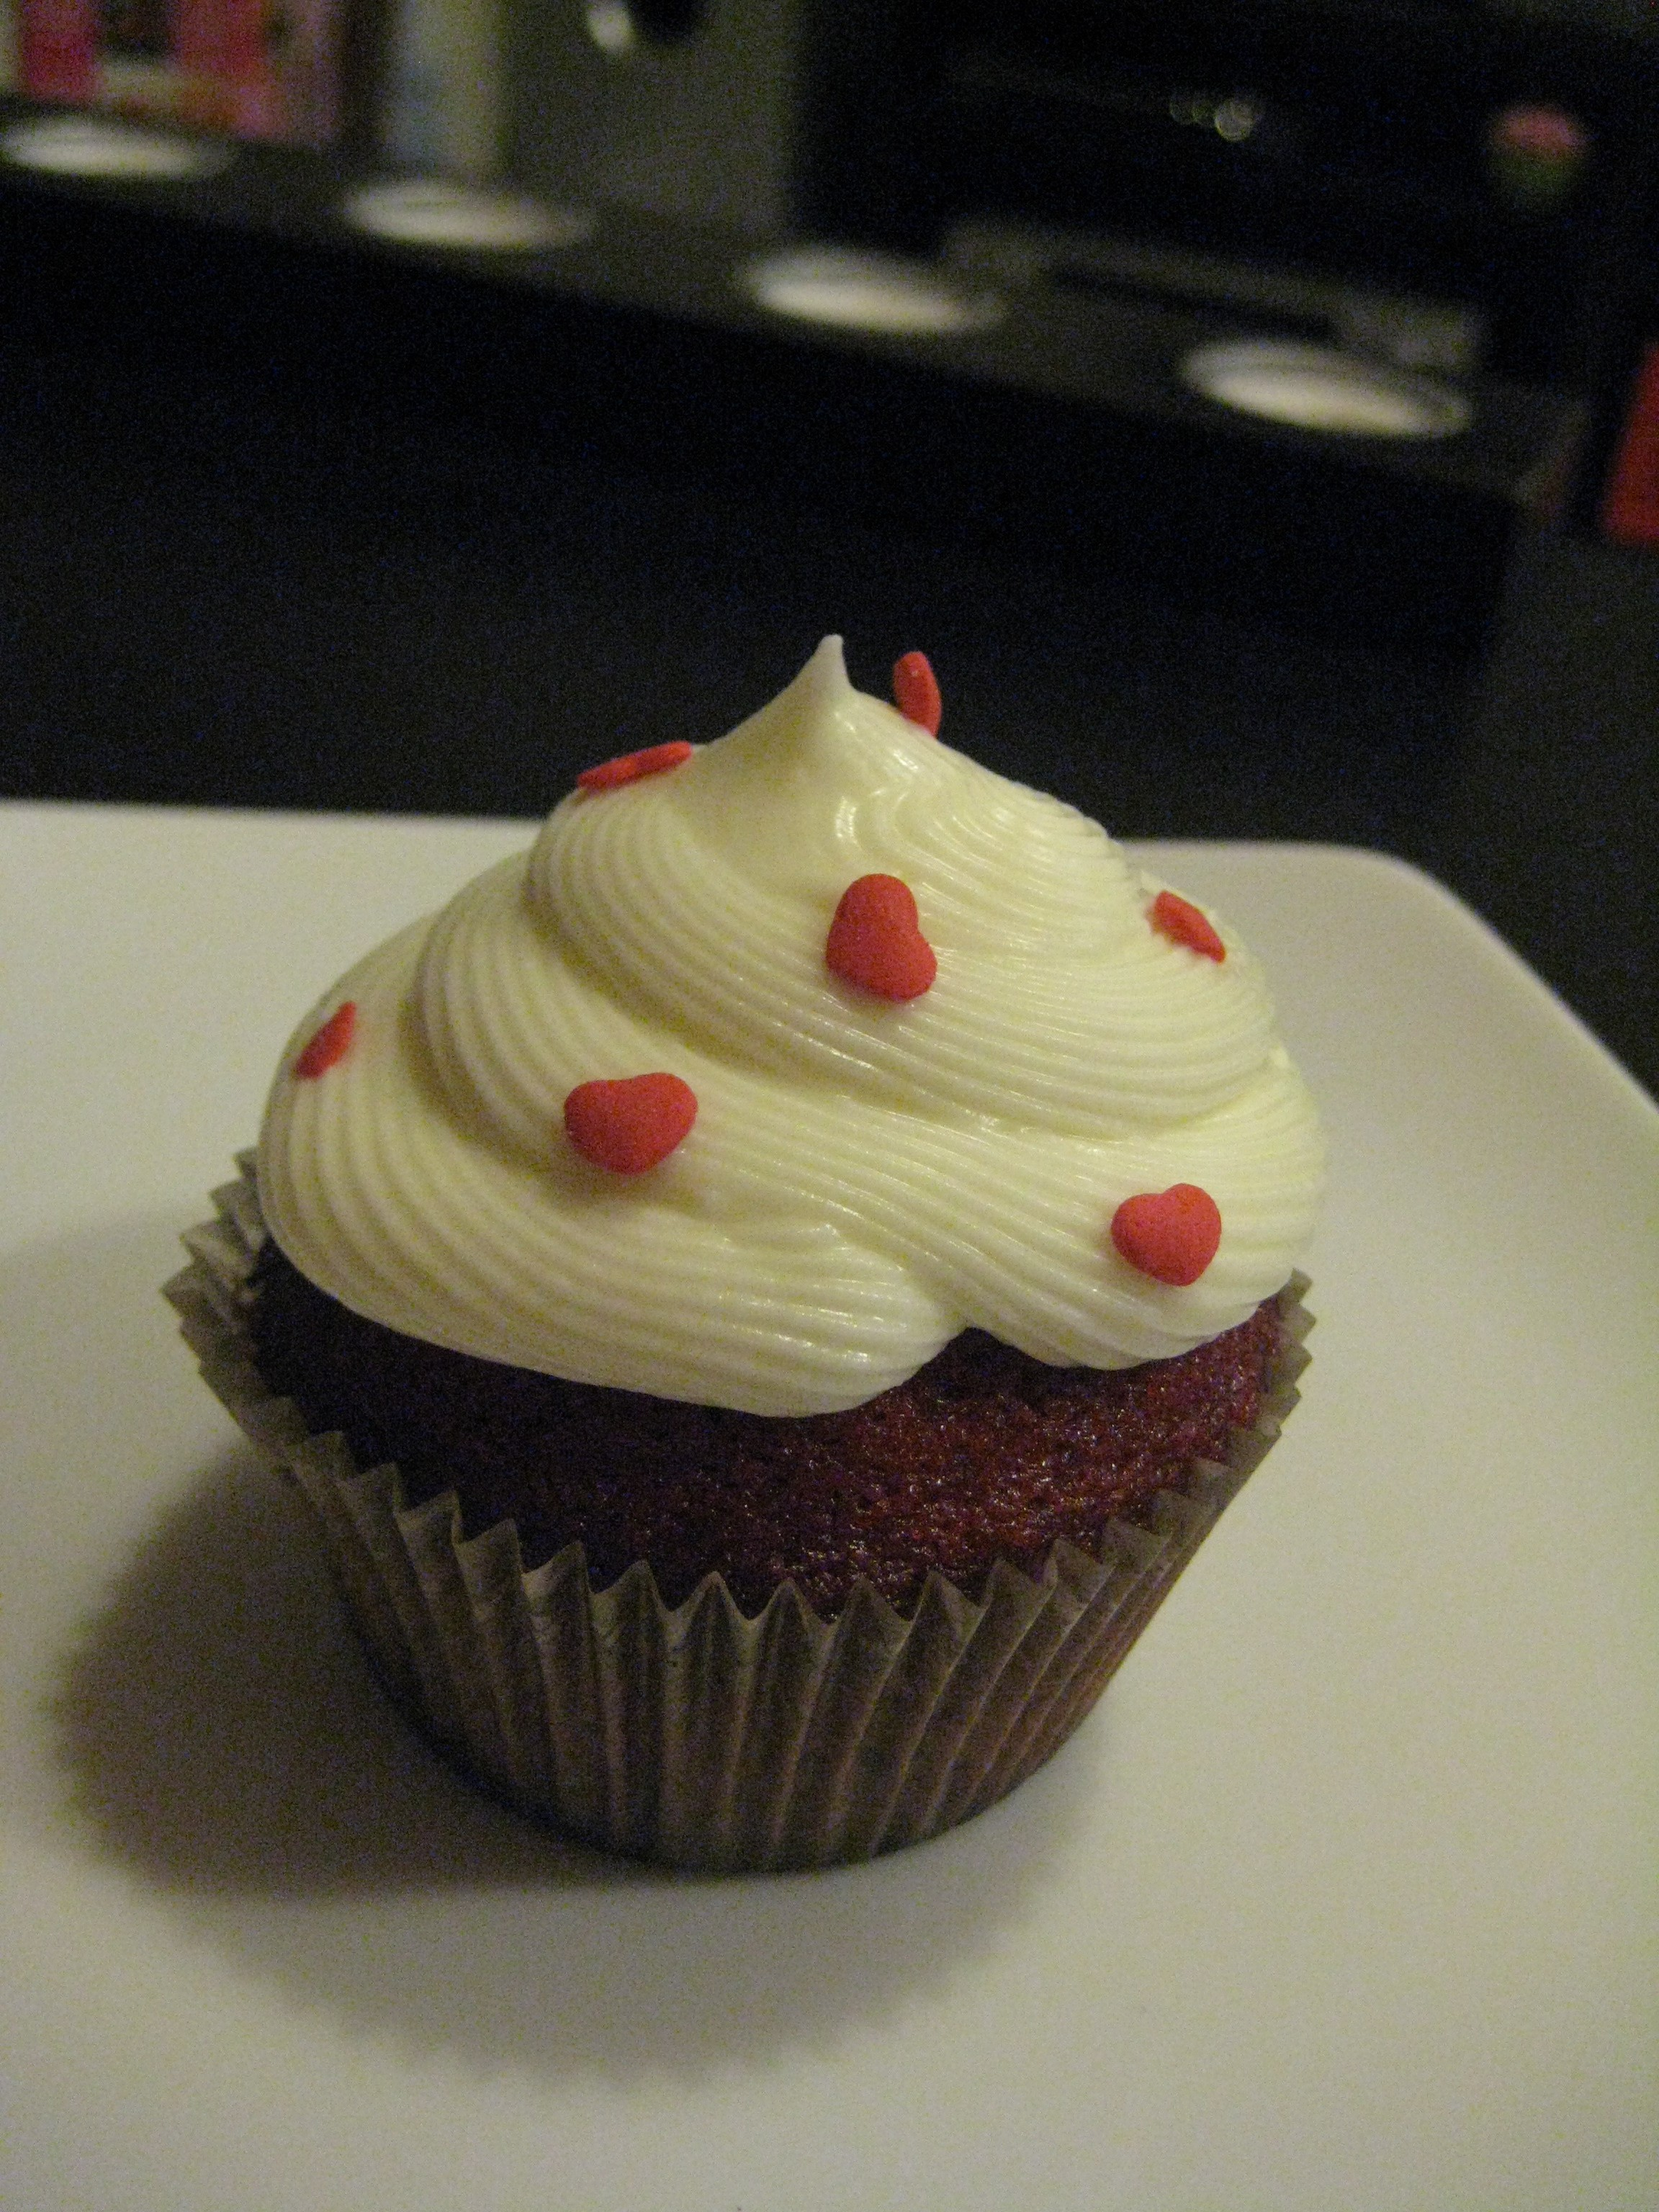 My favorite Red Velvet Cupcake | Sugar, Sprinkles, and Love